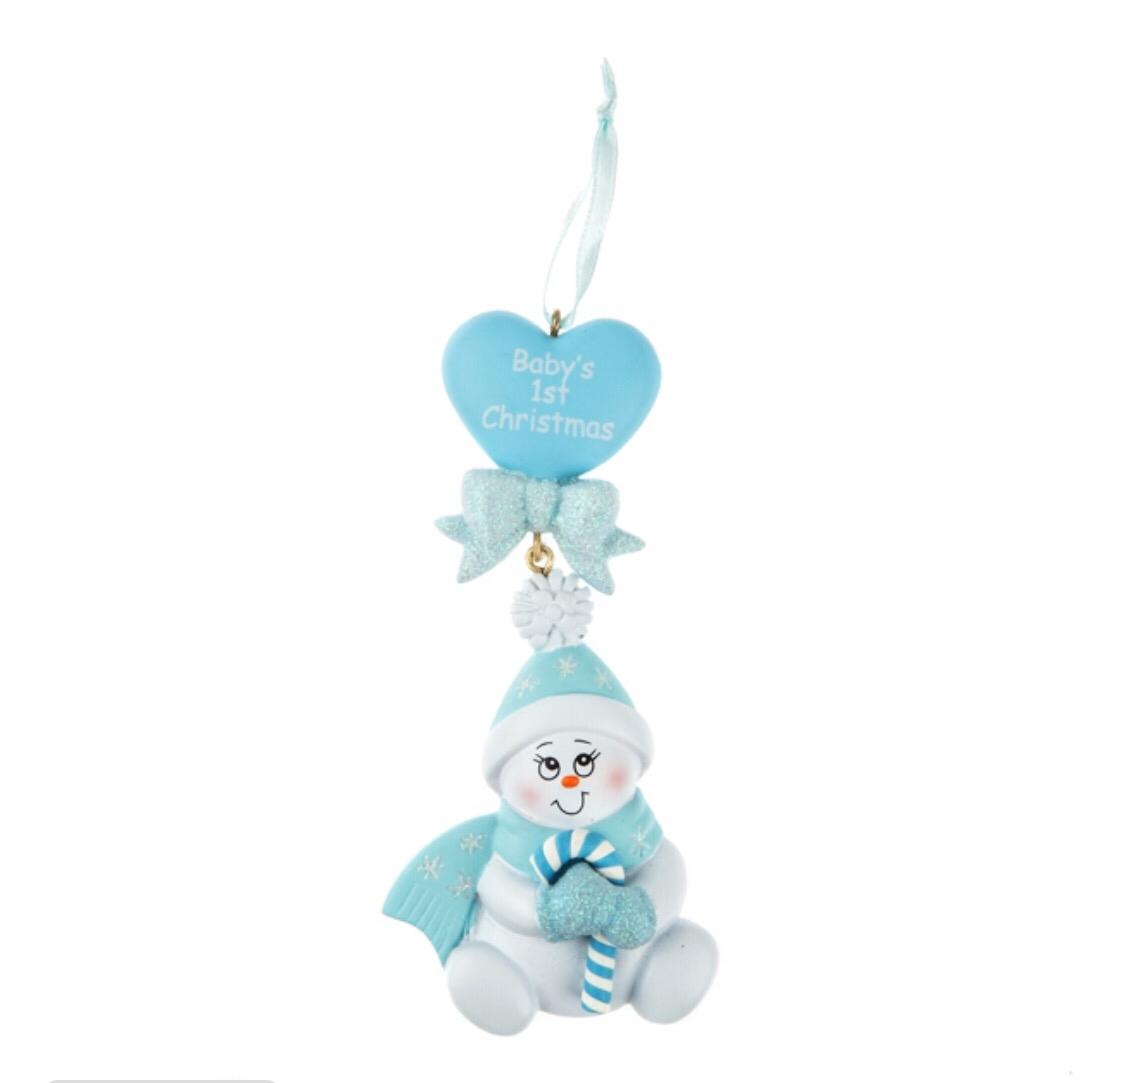 Blue baby heart snowman ornament